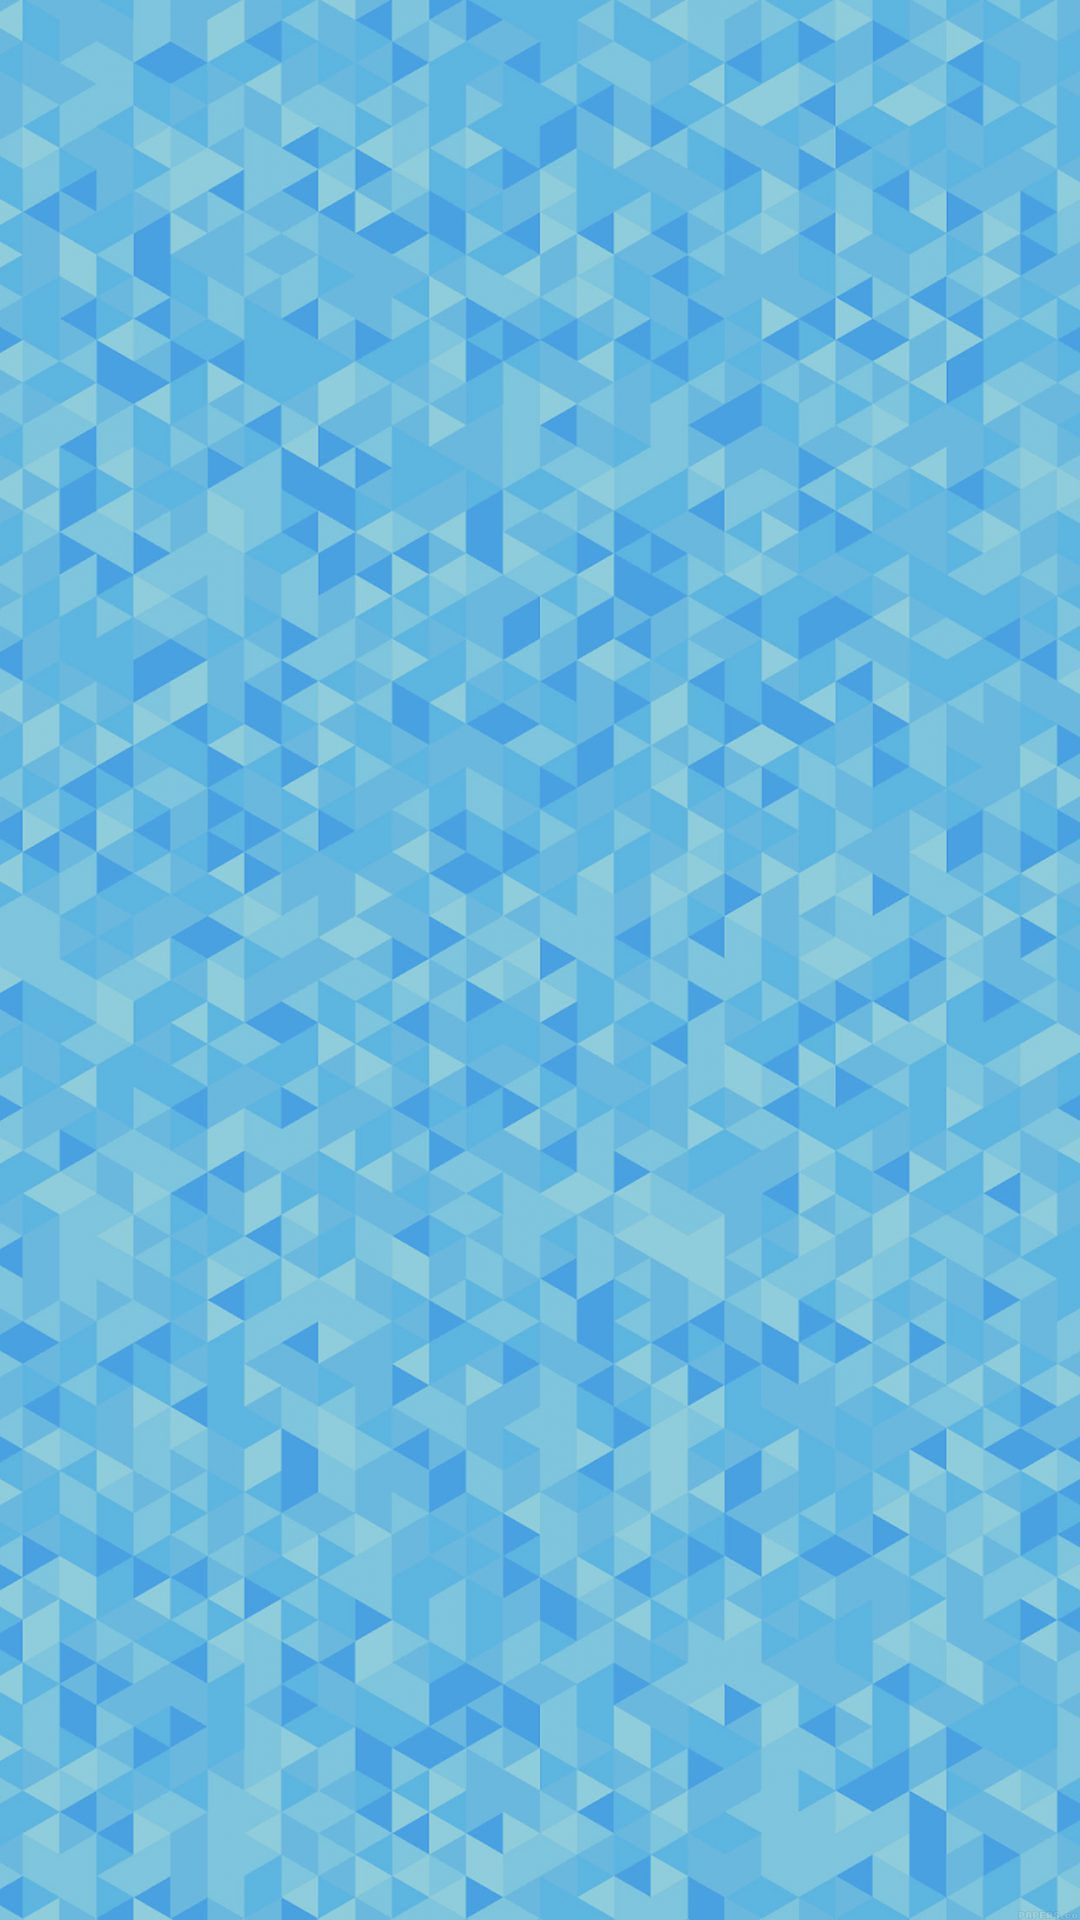 Diamonds Abstract Art Blue Pattern